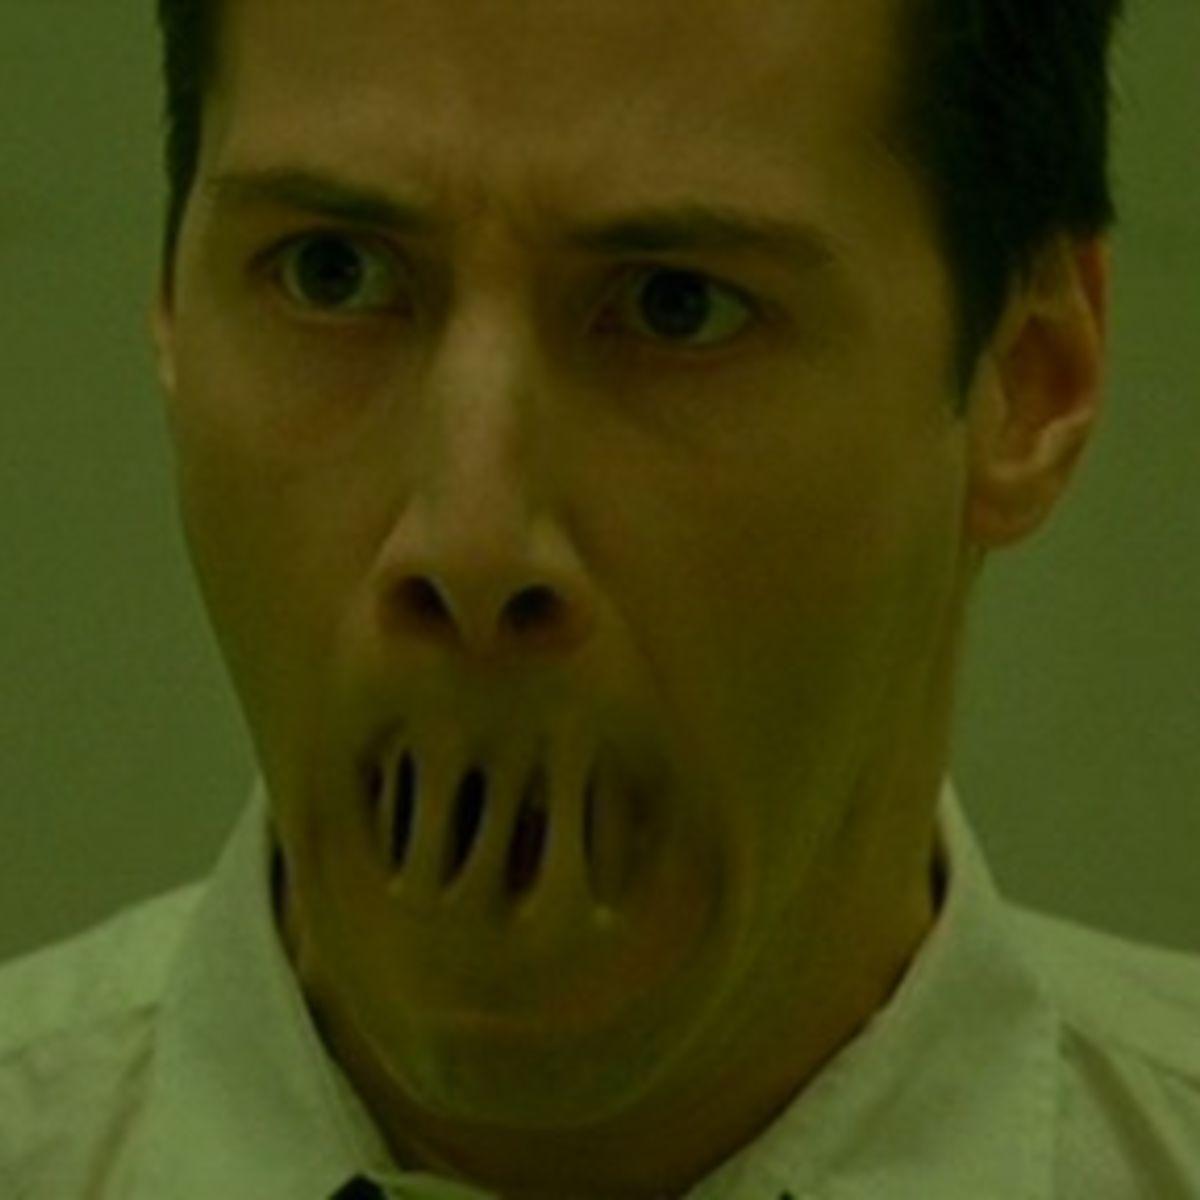 the-matrix-neo-mouth.jpg